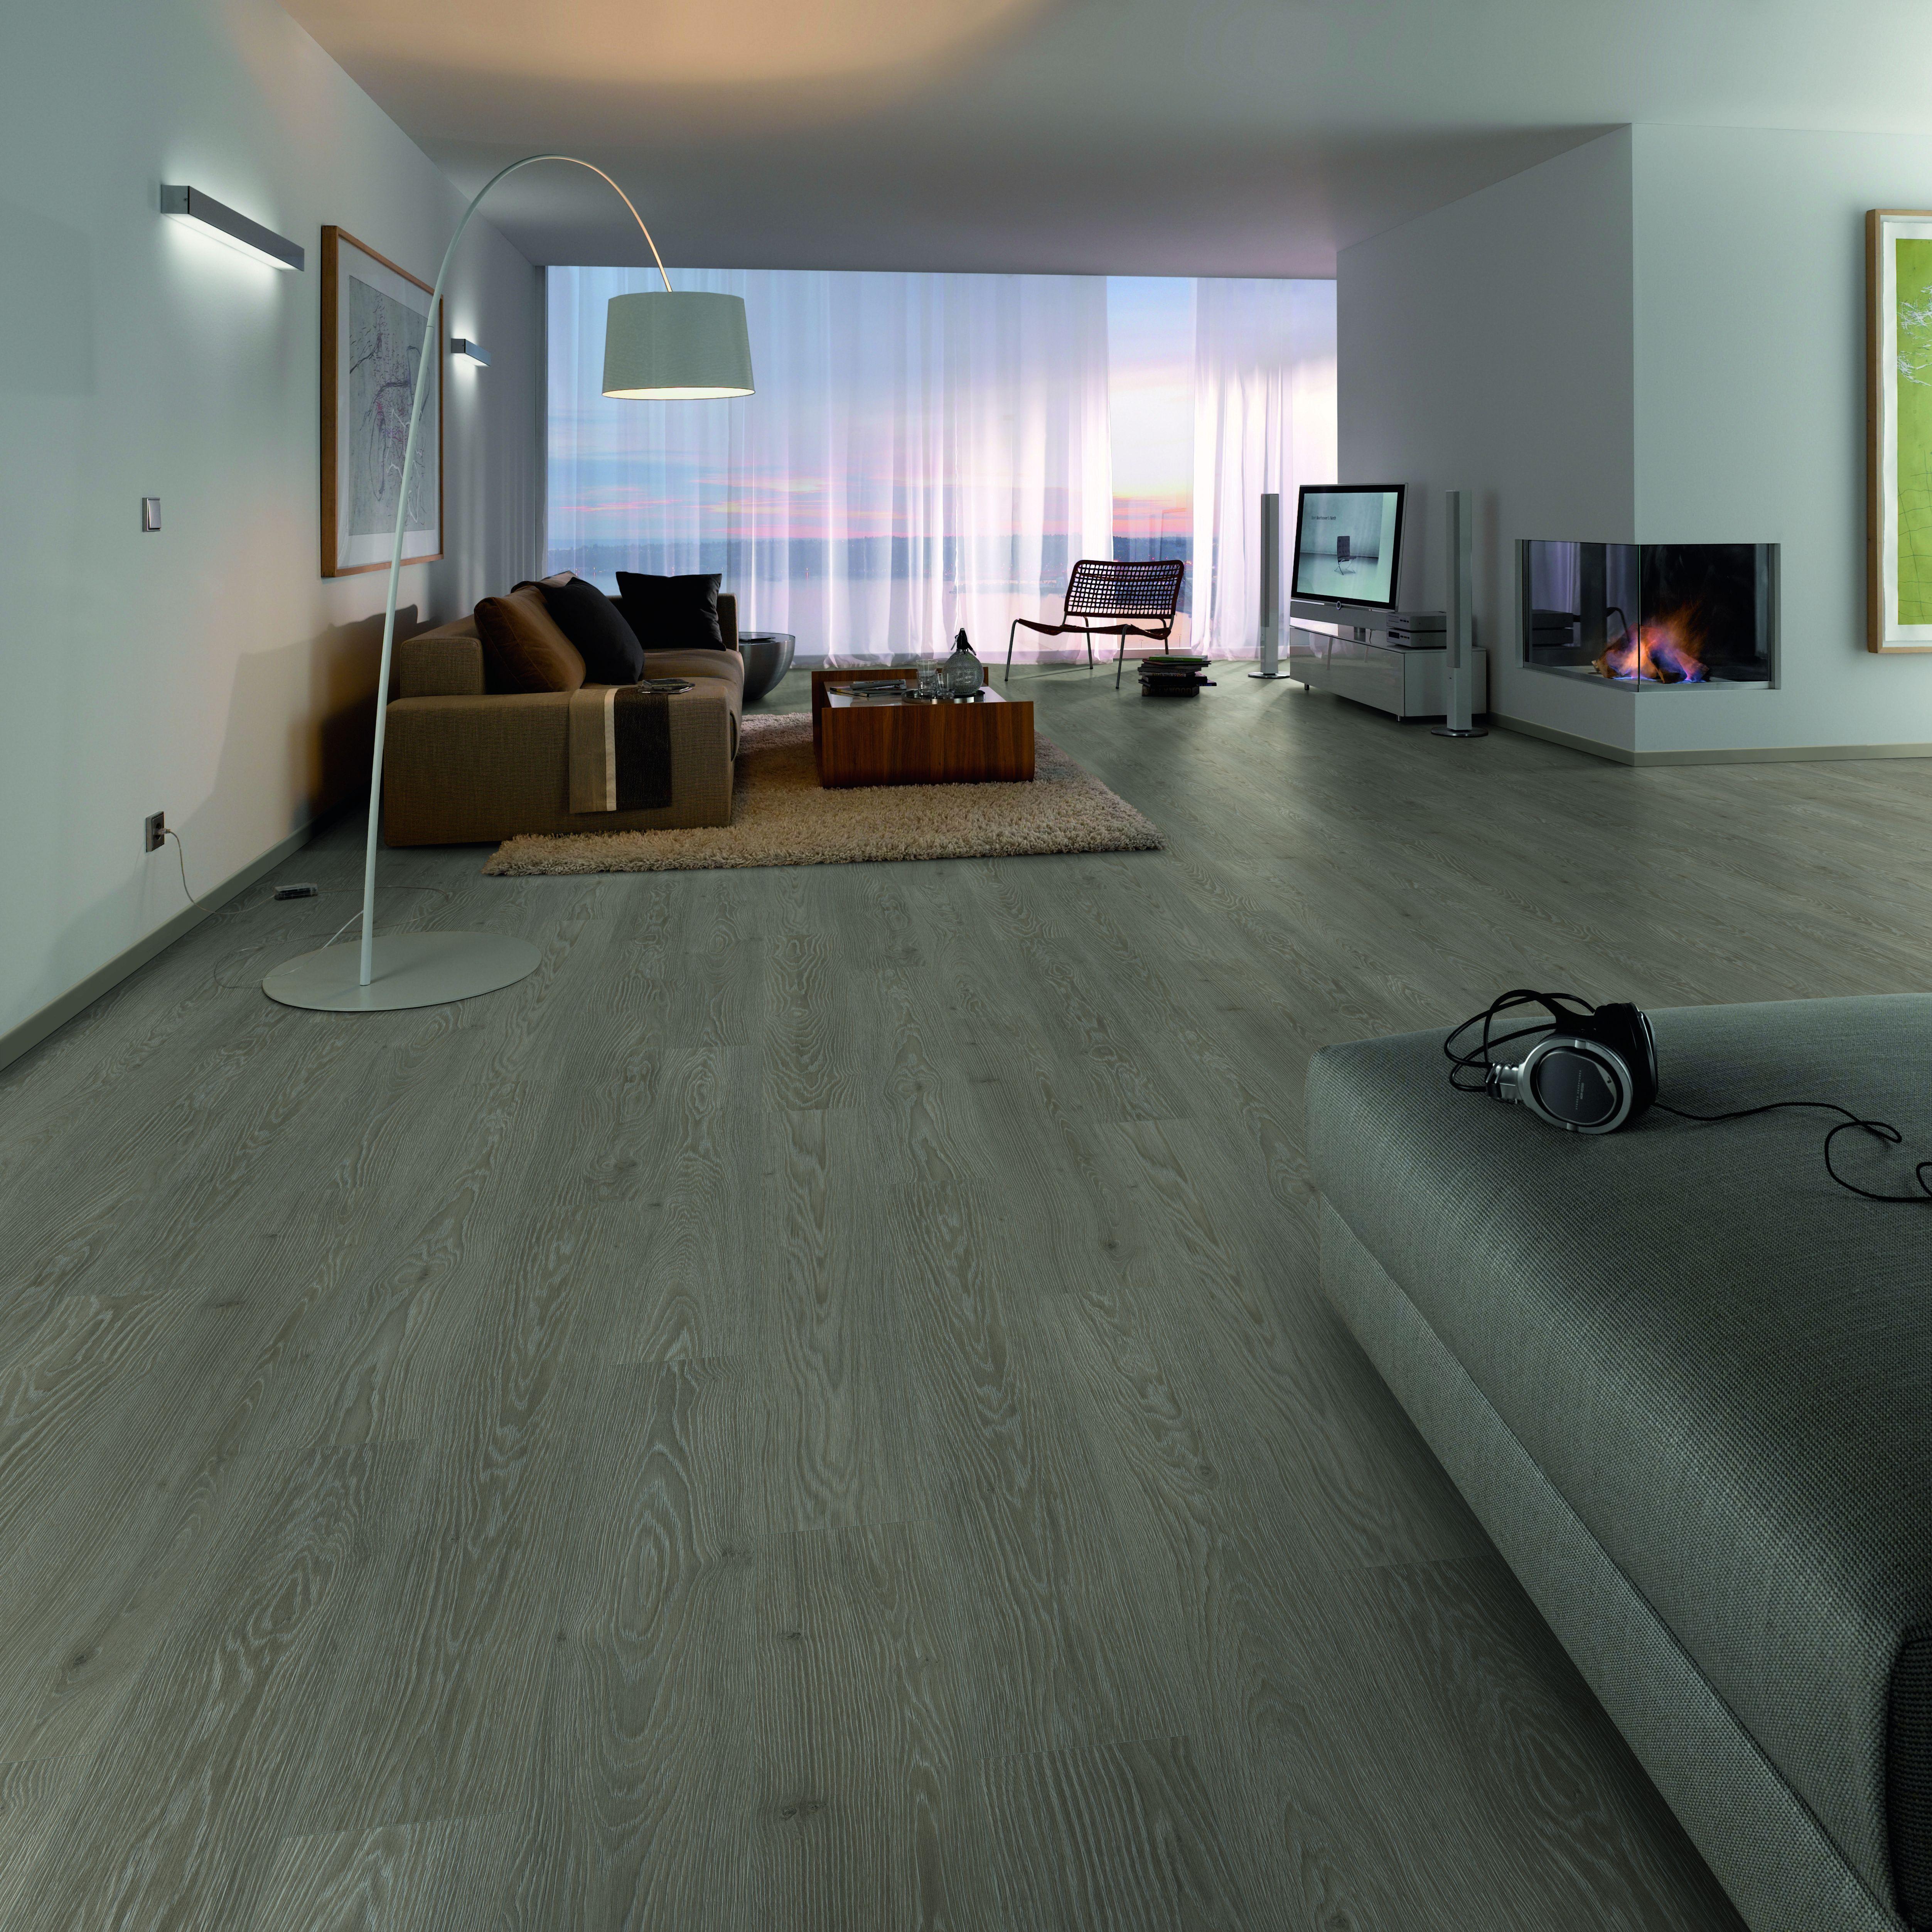 Ламинат Artens «Тангай», 33 класс, толщина 8 мм, 1.986 м²